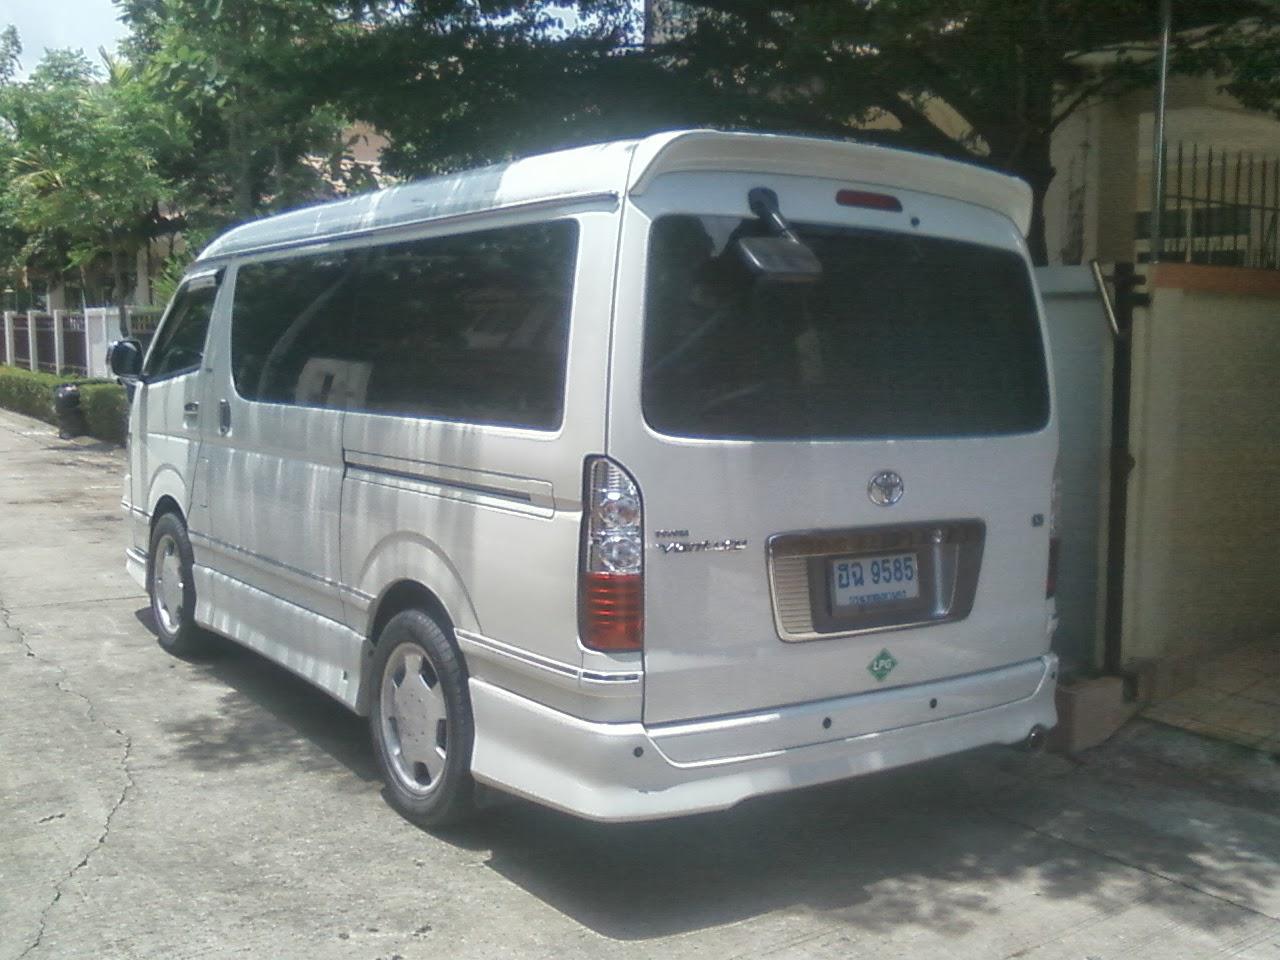 ventury 2.7 vip luxury ราคาเช่า 2,200 - 2,500  บาท เครื่องยนต์ เบนซิน+LPG ไม่เกิน 9ที่นั่ง